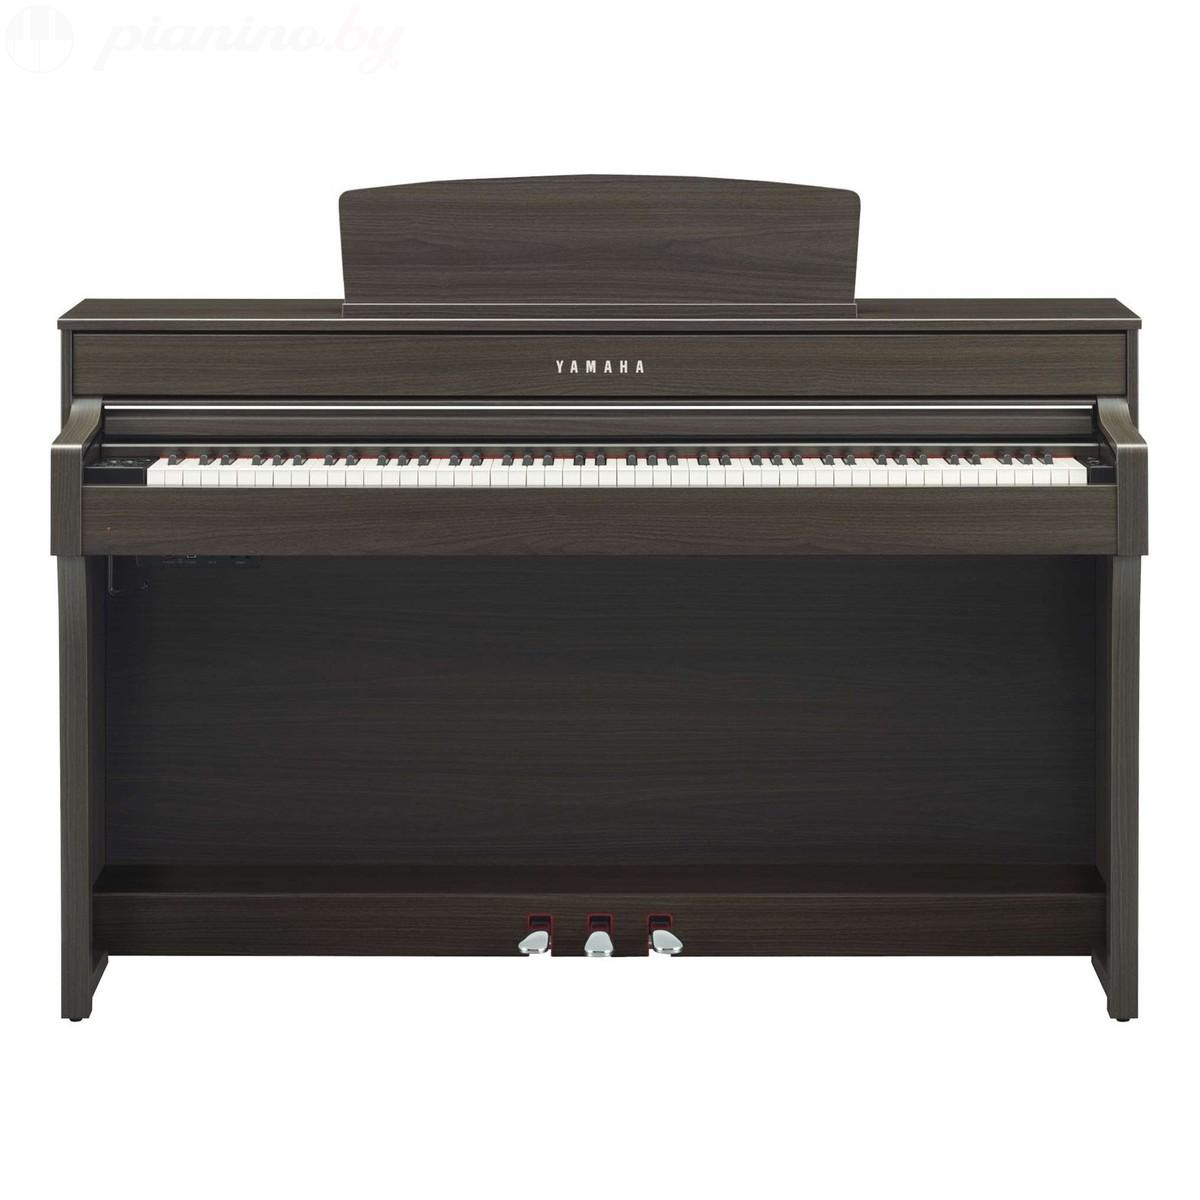 Цифровое пианино Yamaha Clavinova CLP-645 Dark Walnut Фото 2